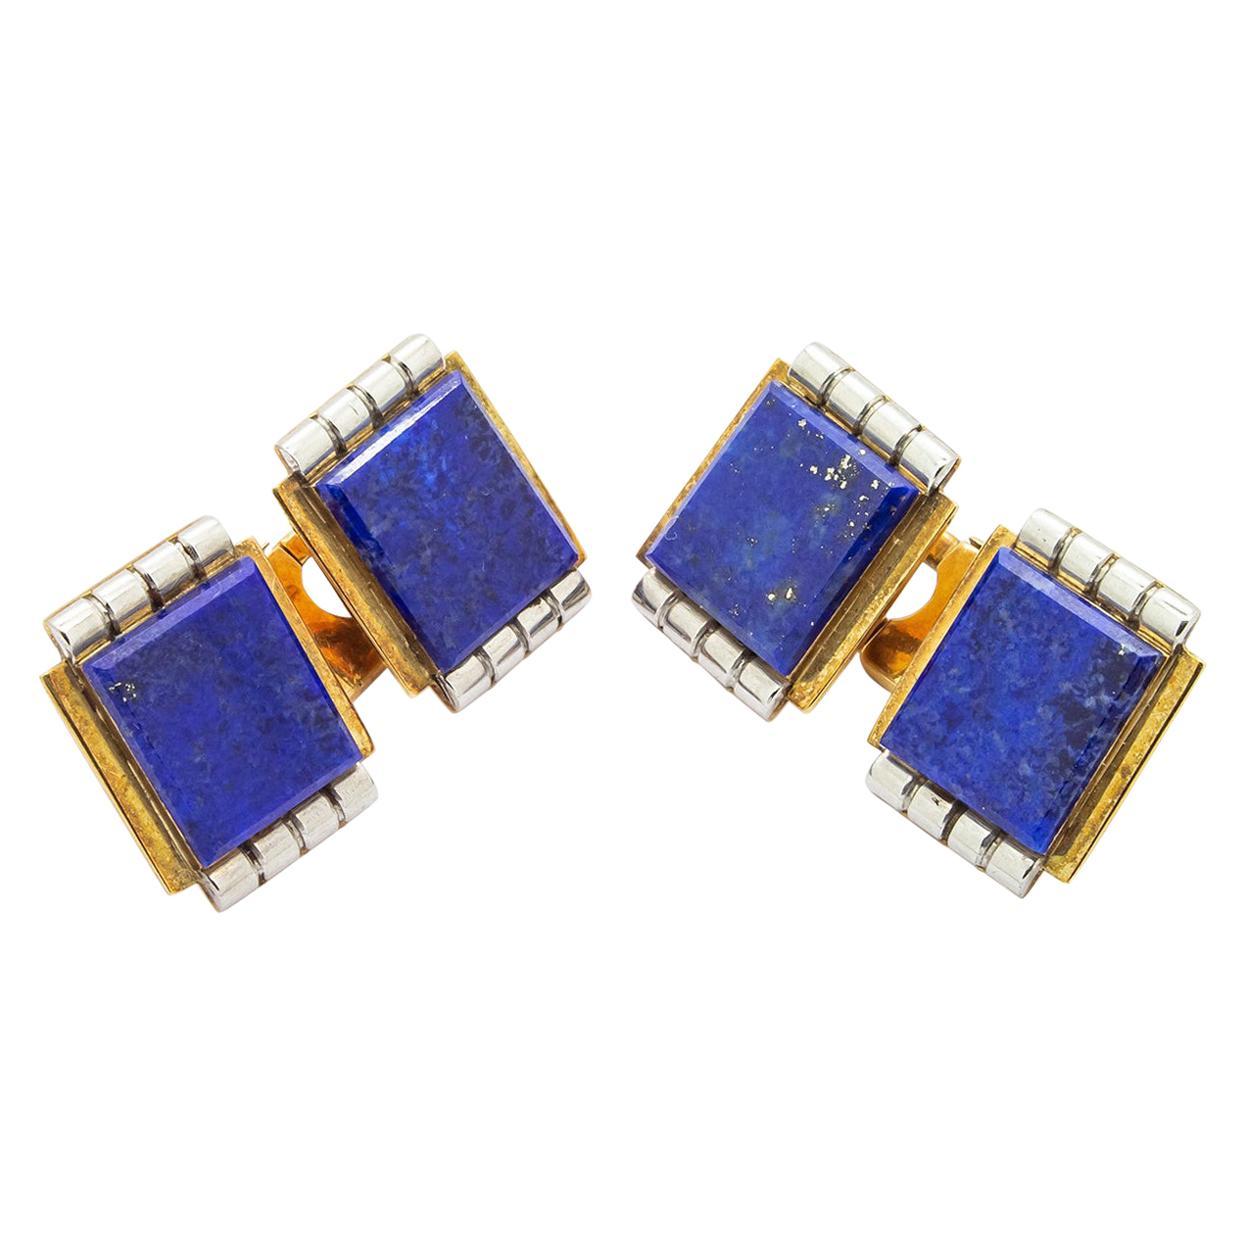 Art Deco Lapis Lazuli Gold Cufflinks